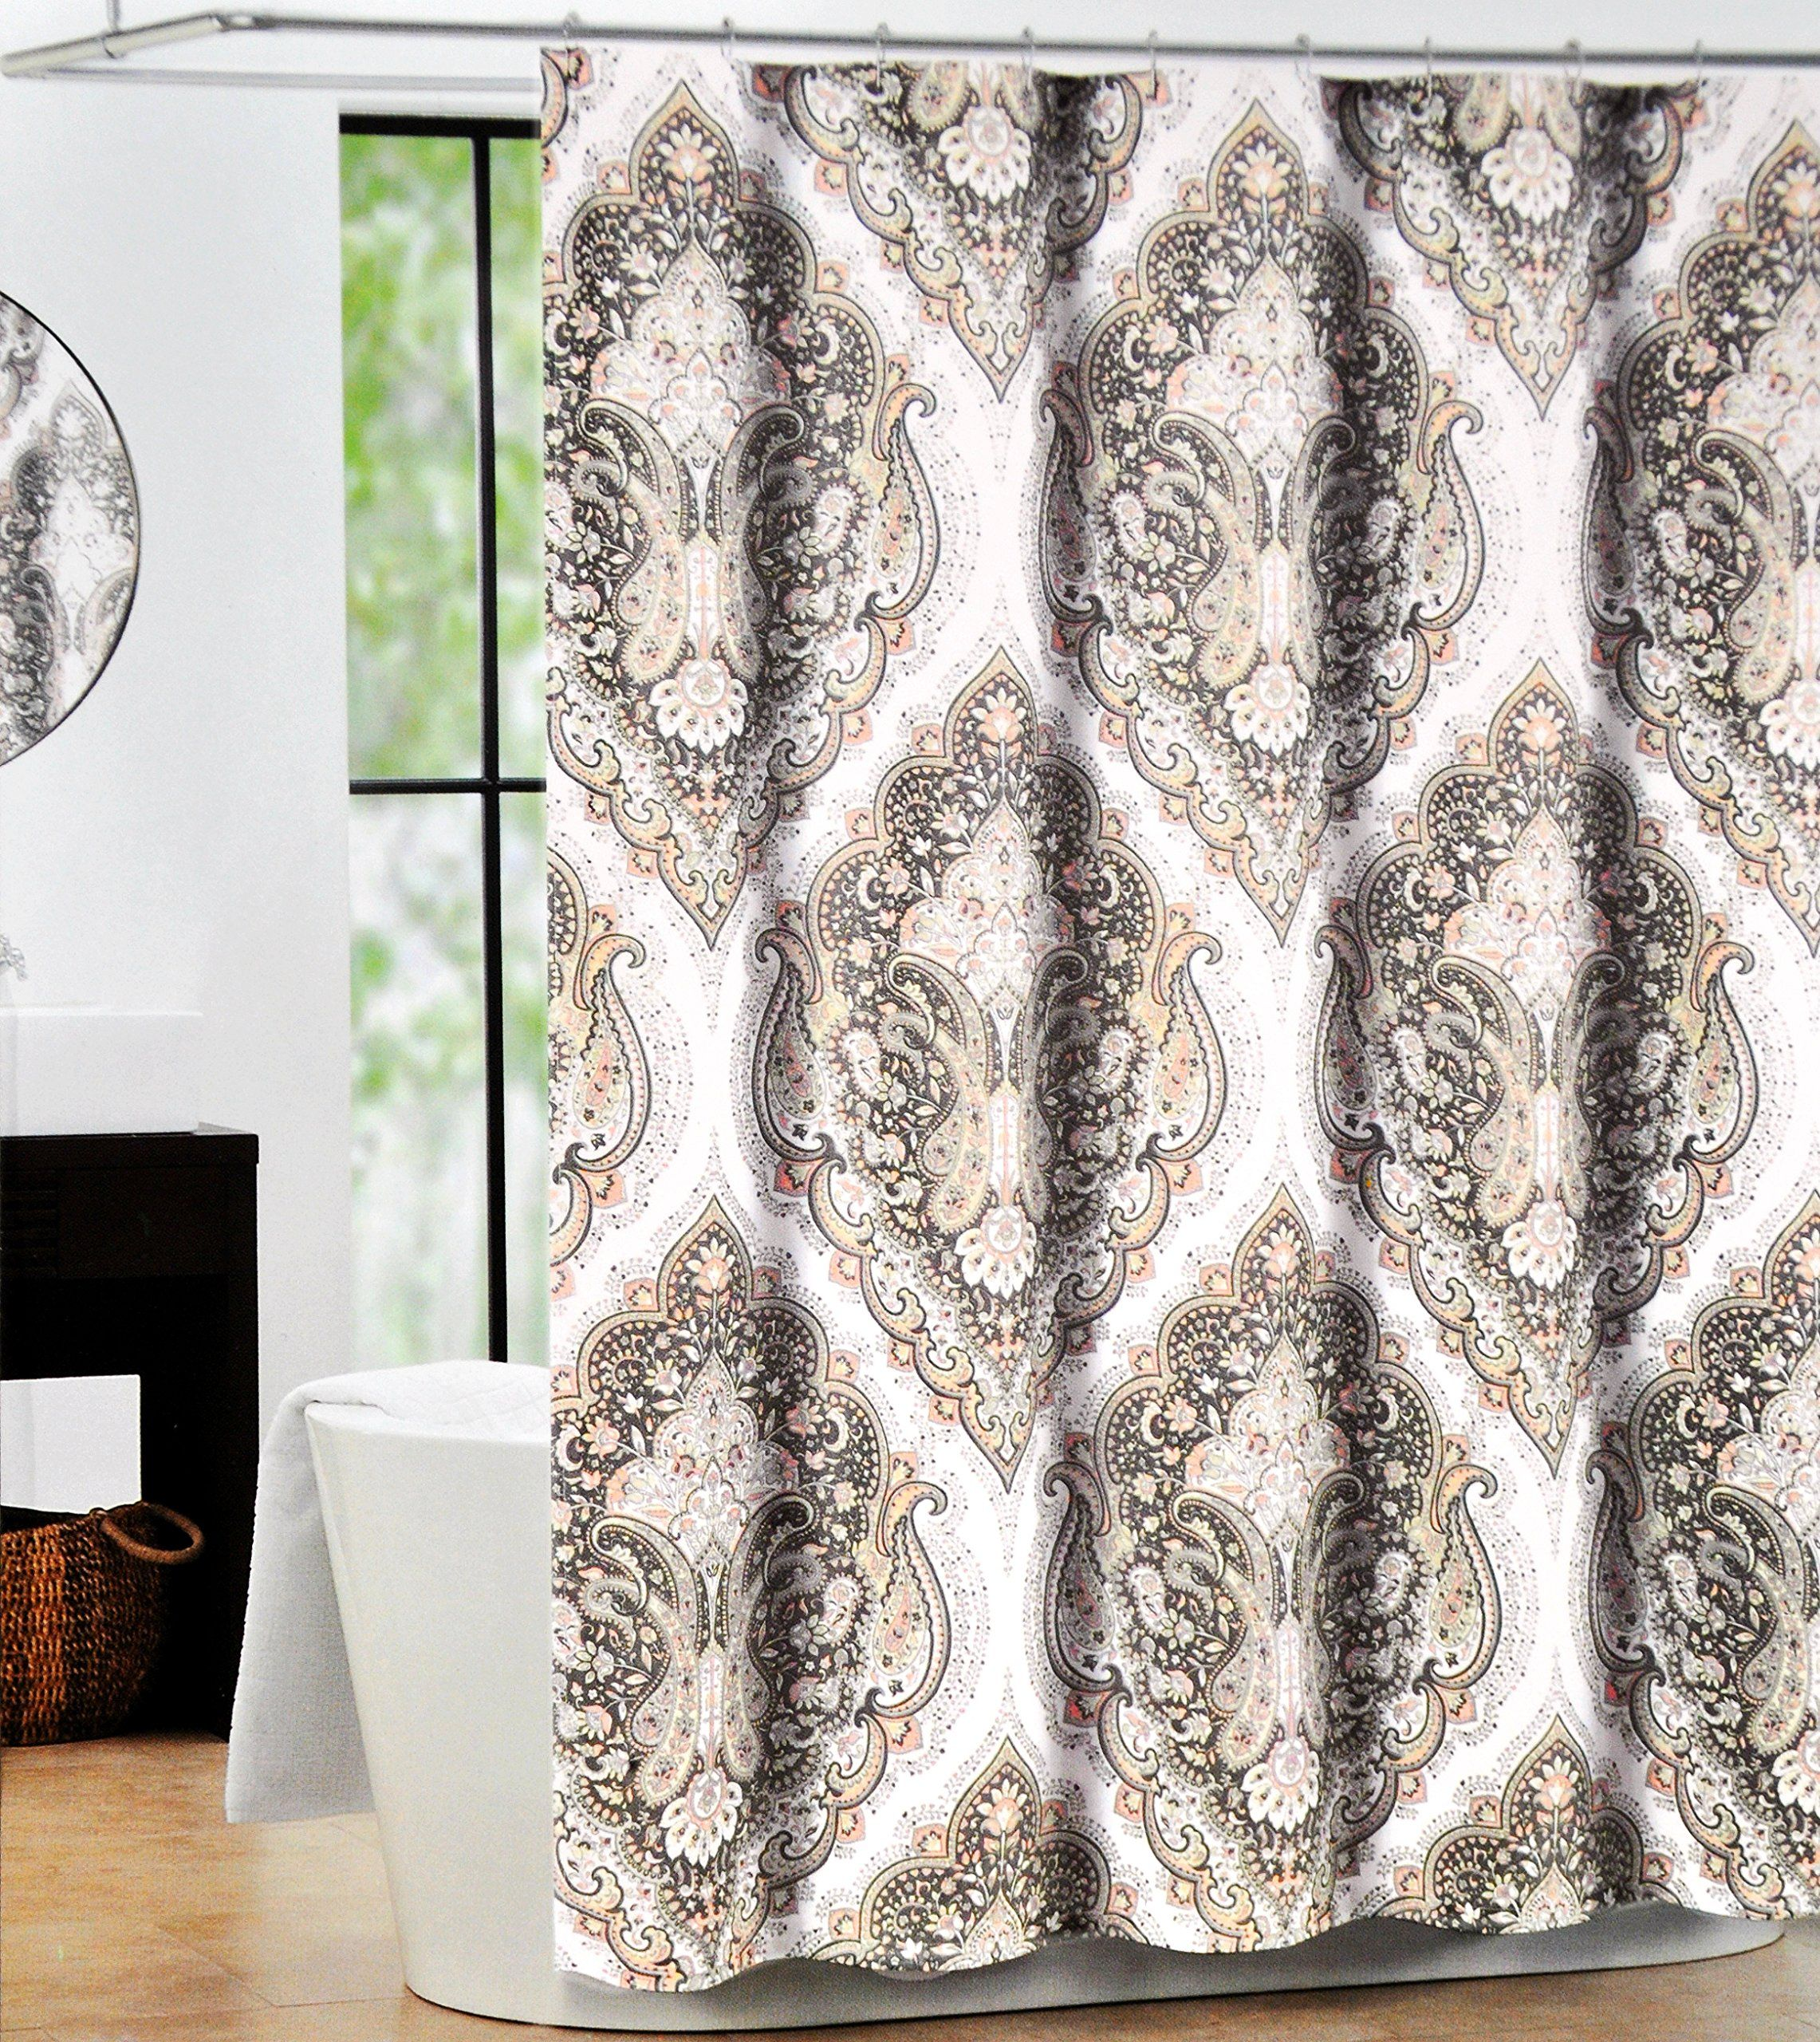 Tahari Luxury Cotton Blend Shower Curtain Coral Peach Taupe Paisley Design,  Salma